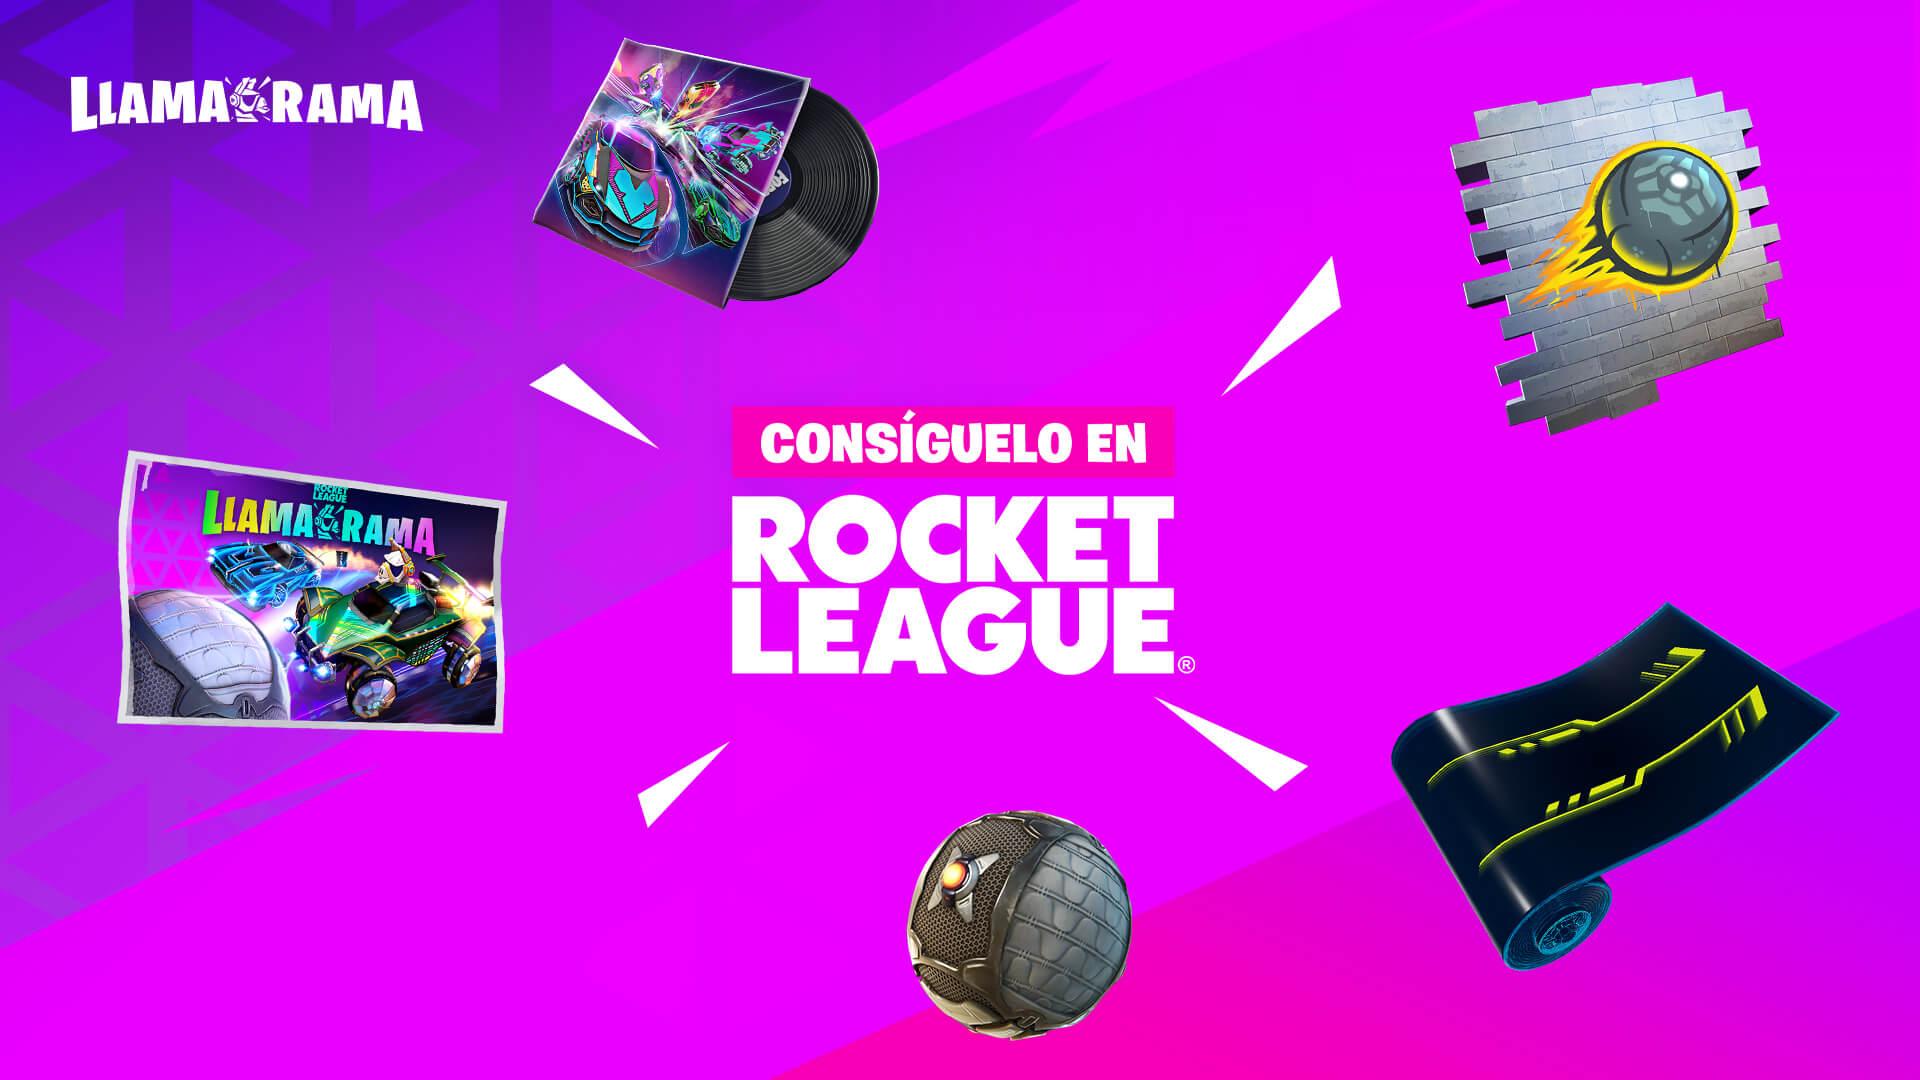 ES MX 16BR RocketLeague Llama Rama Rewards V2 Social